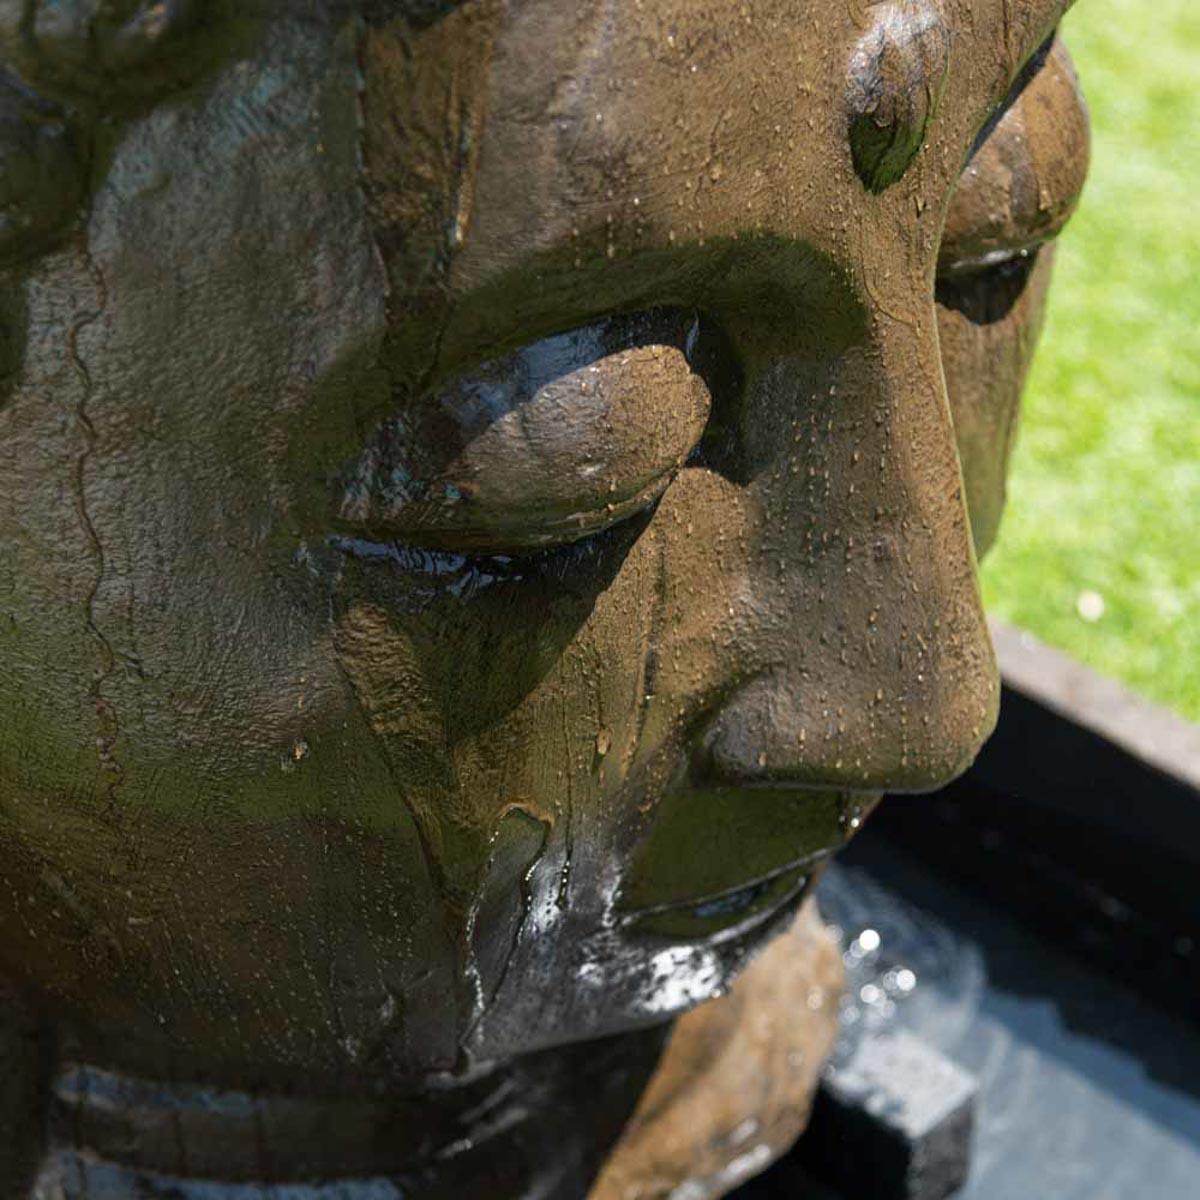 Fontaine De Jardin Fontaine Avec Bassin T Te De Bouddha